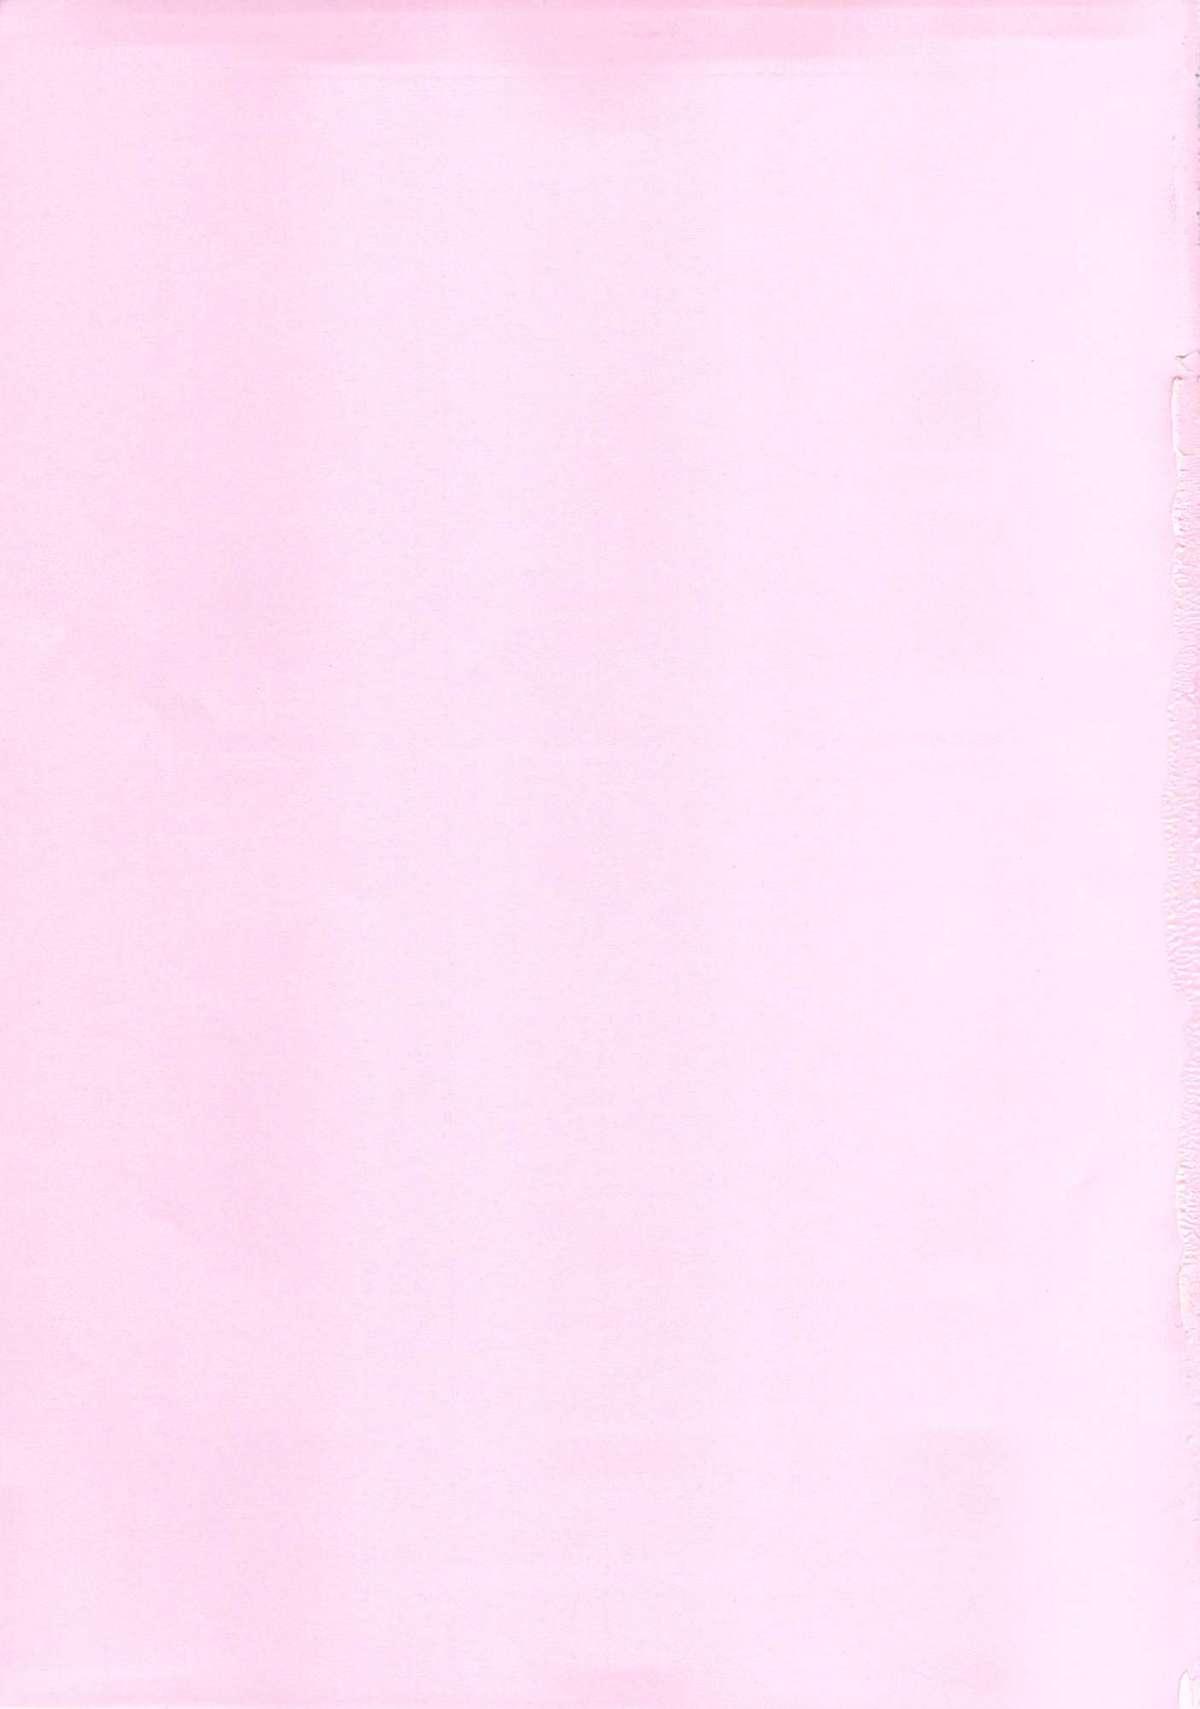 Bou Yuumei Koukou Joshi Toilet Tousatsu 2-jigen Bishoujo Hen Vol. 4 33